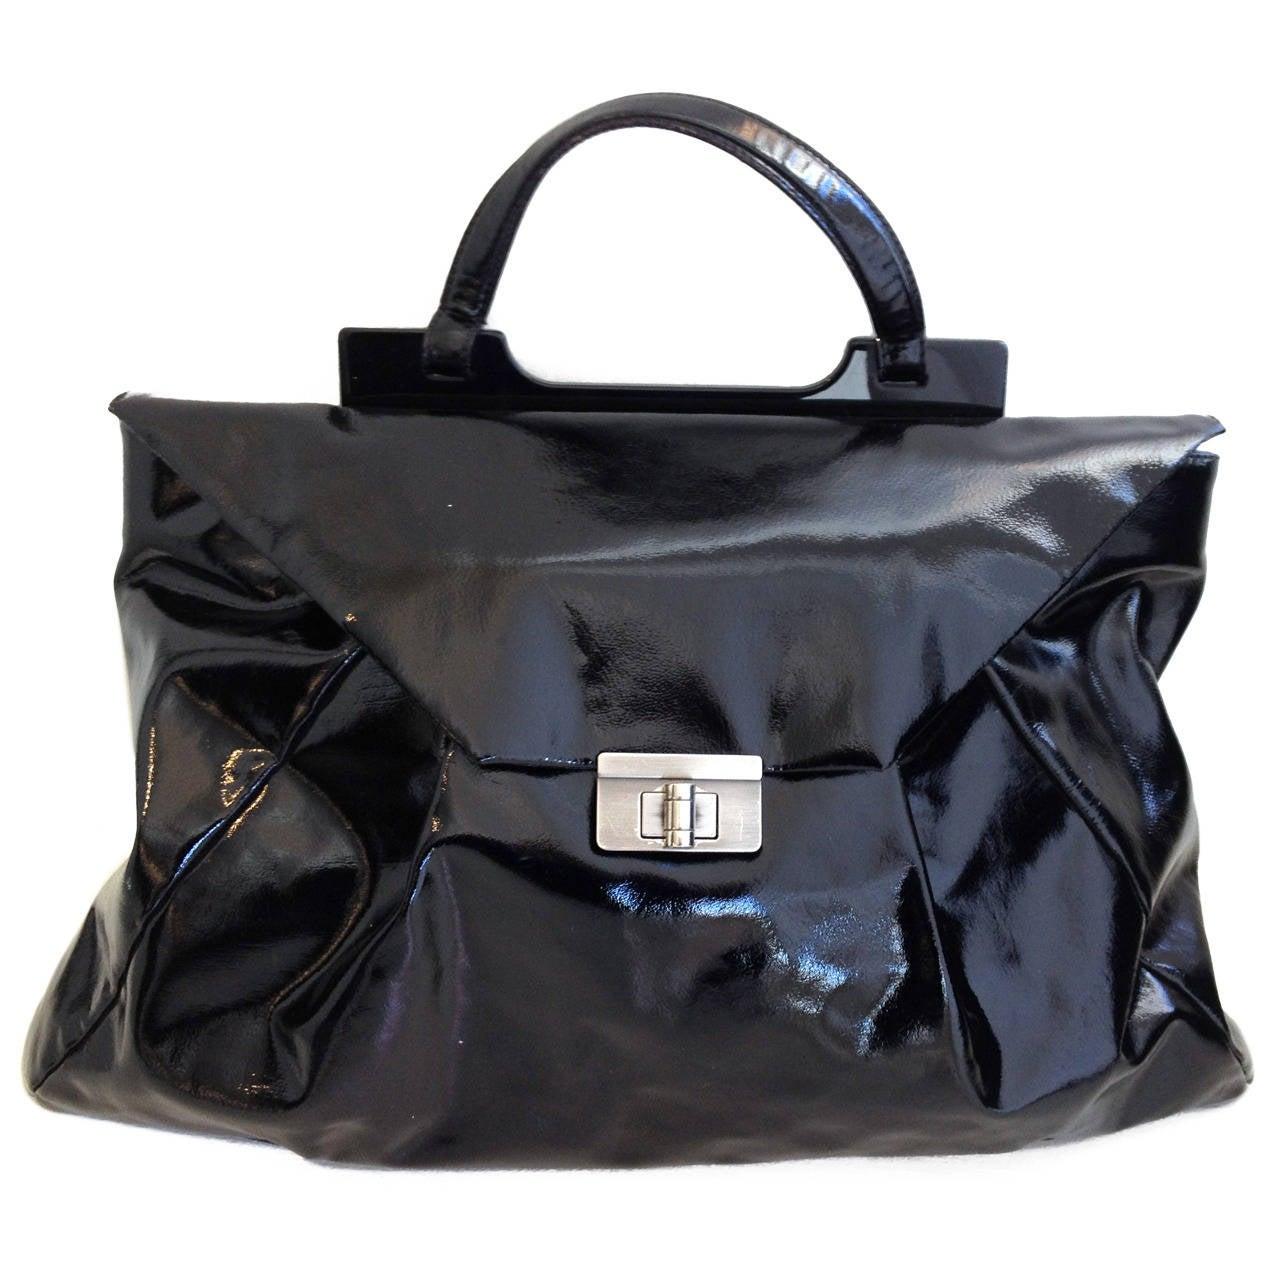 445a550550 Marni Black Patent Leather Envelope Bag at 1stdibs